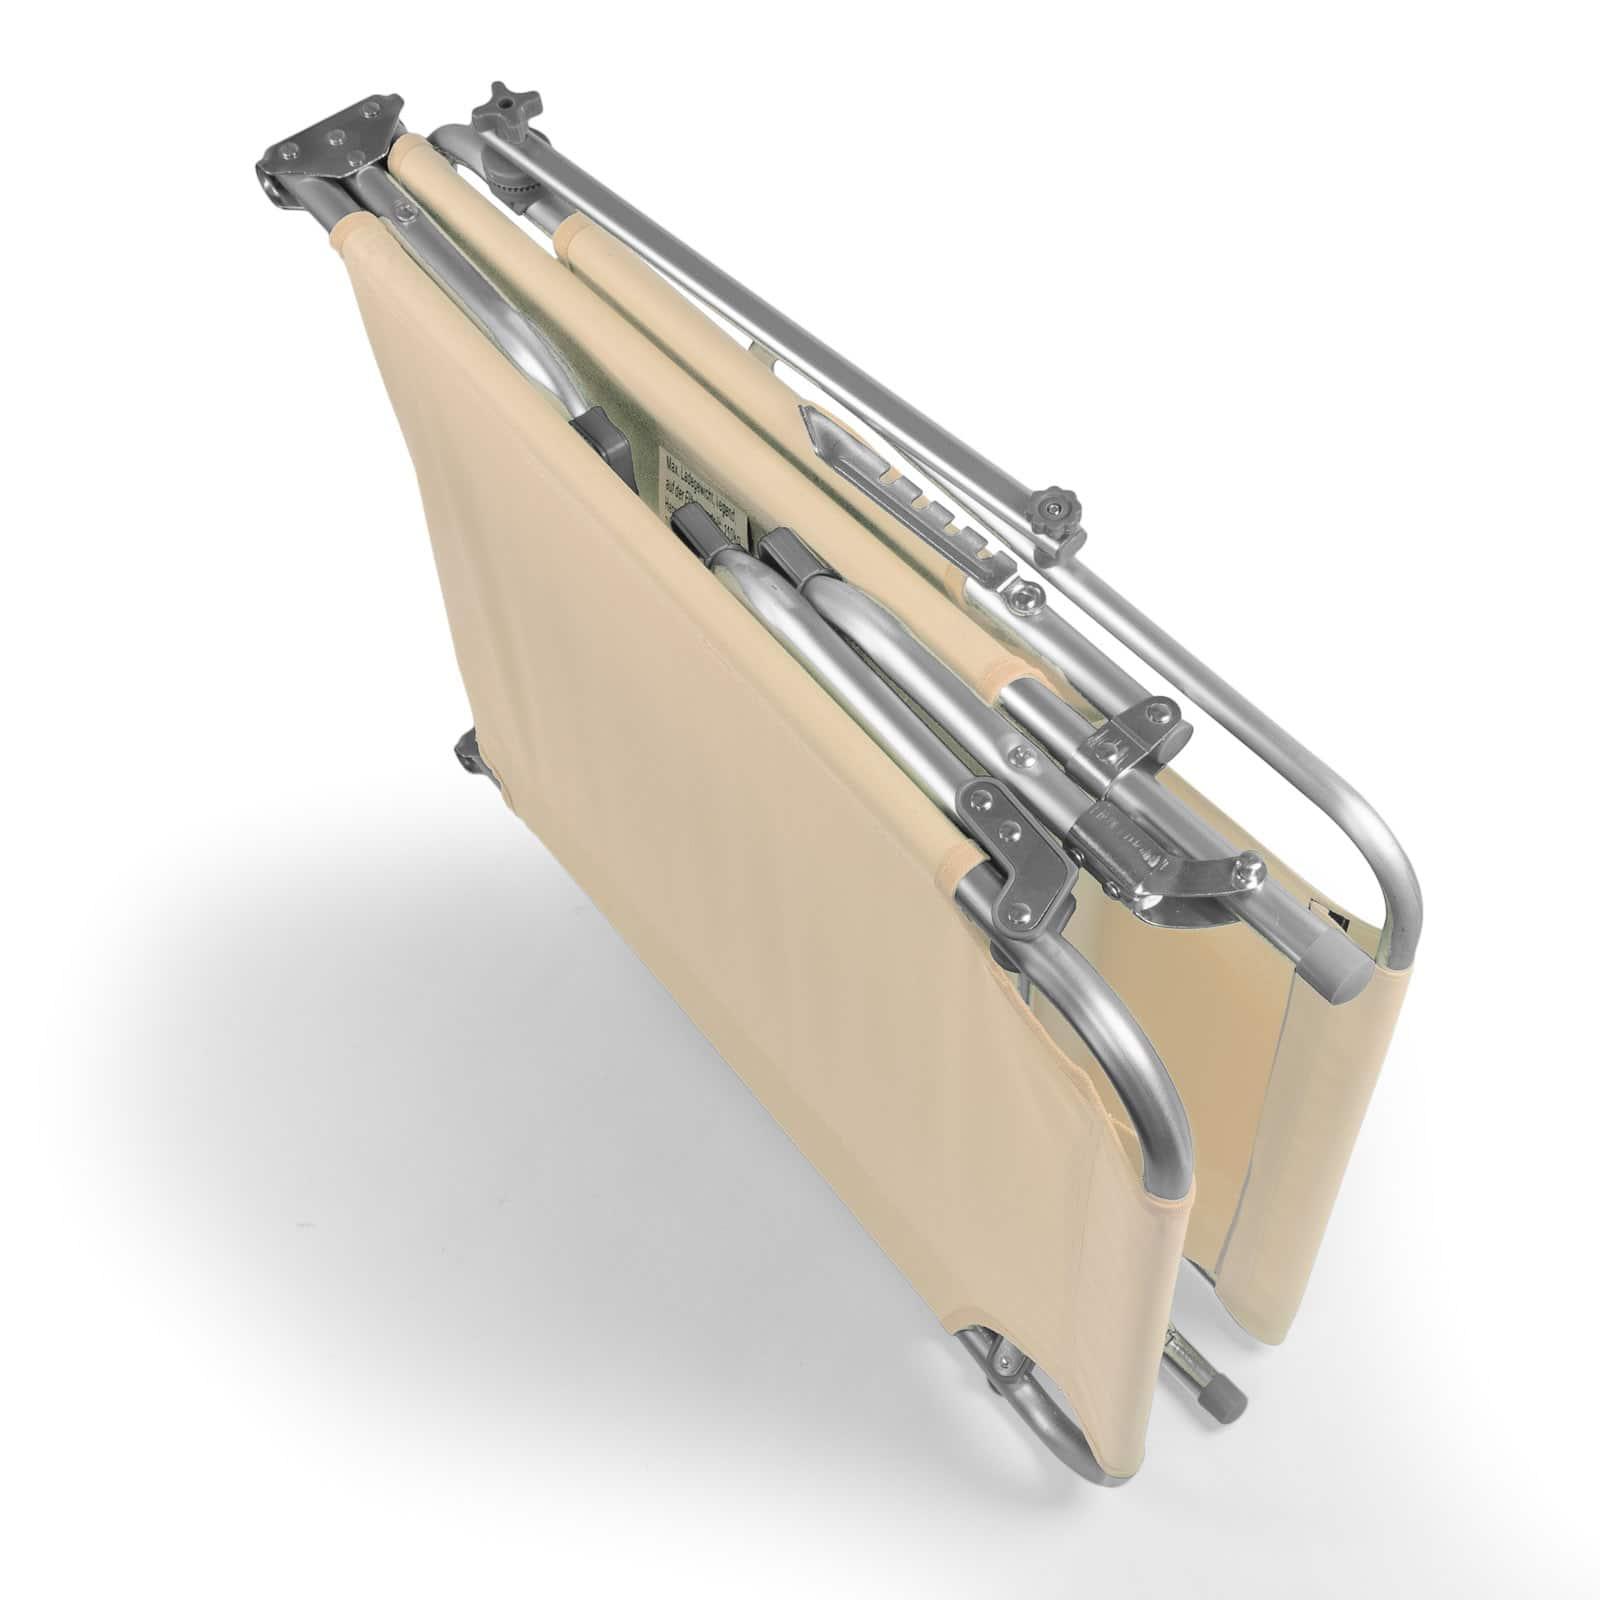 Comfortabel Aluminium Ligbed met Zonnendak 190x57 cm - Zandkleurig